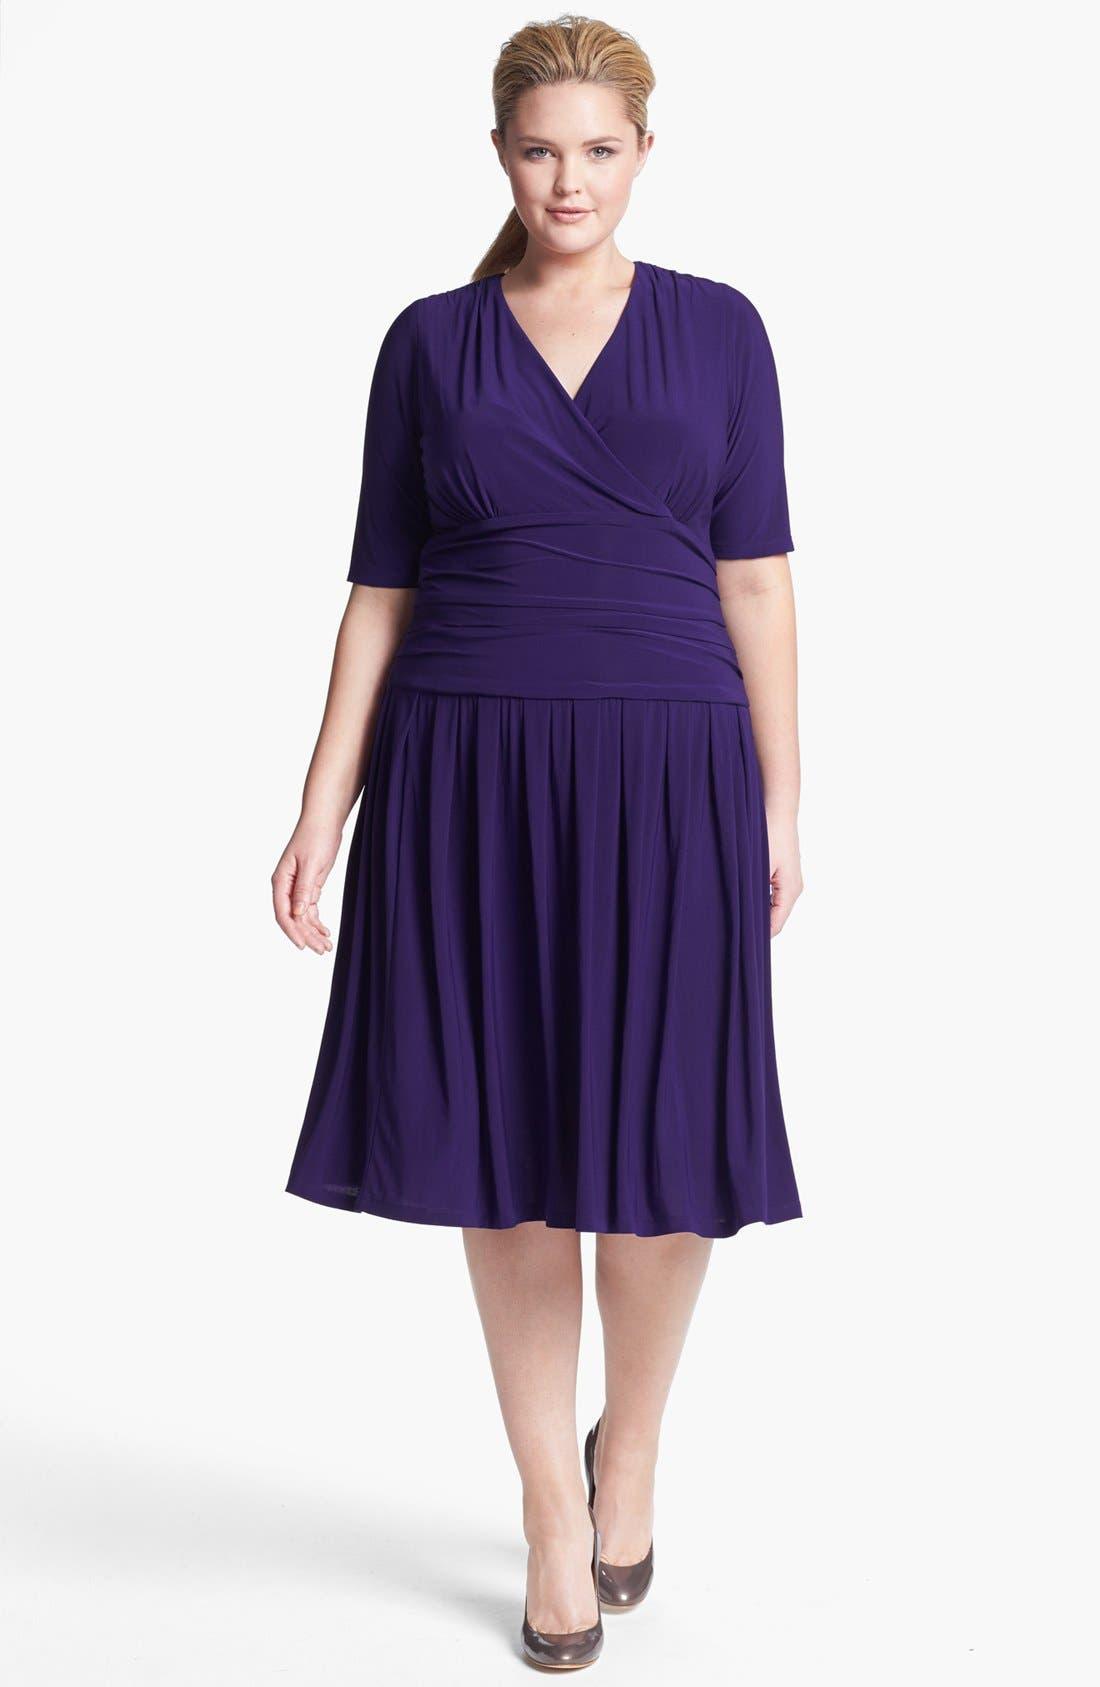 Alternate Image 1 Selected - Eliza J Jersey Fit & Flare Dress (Plus Size) (Online Only)